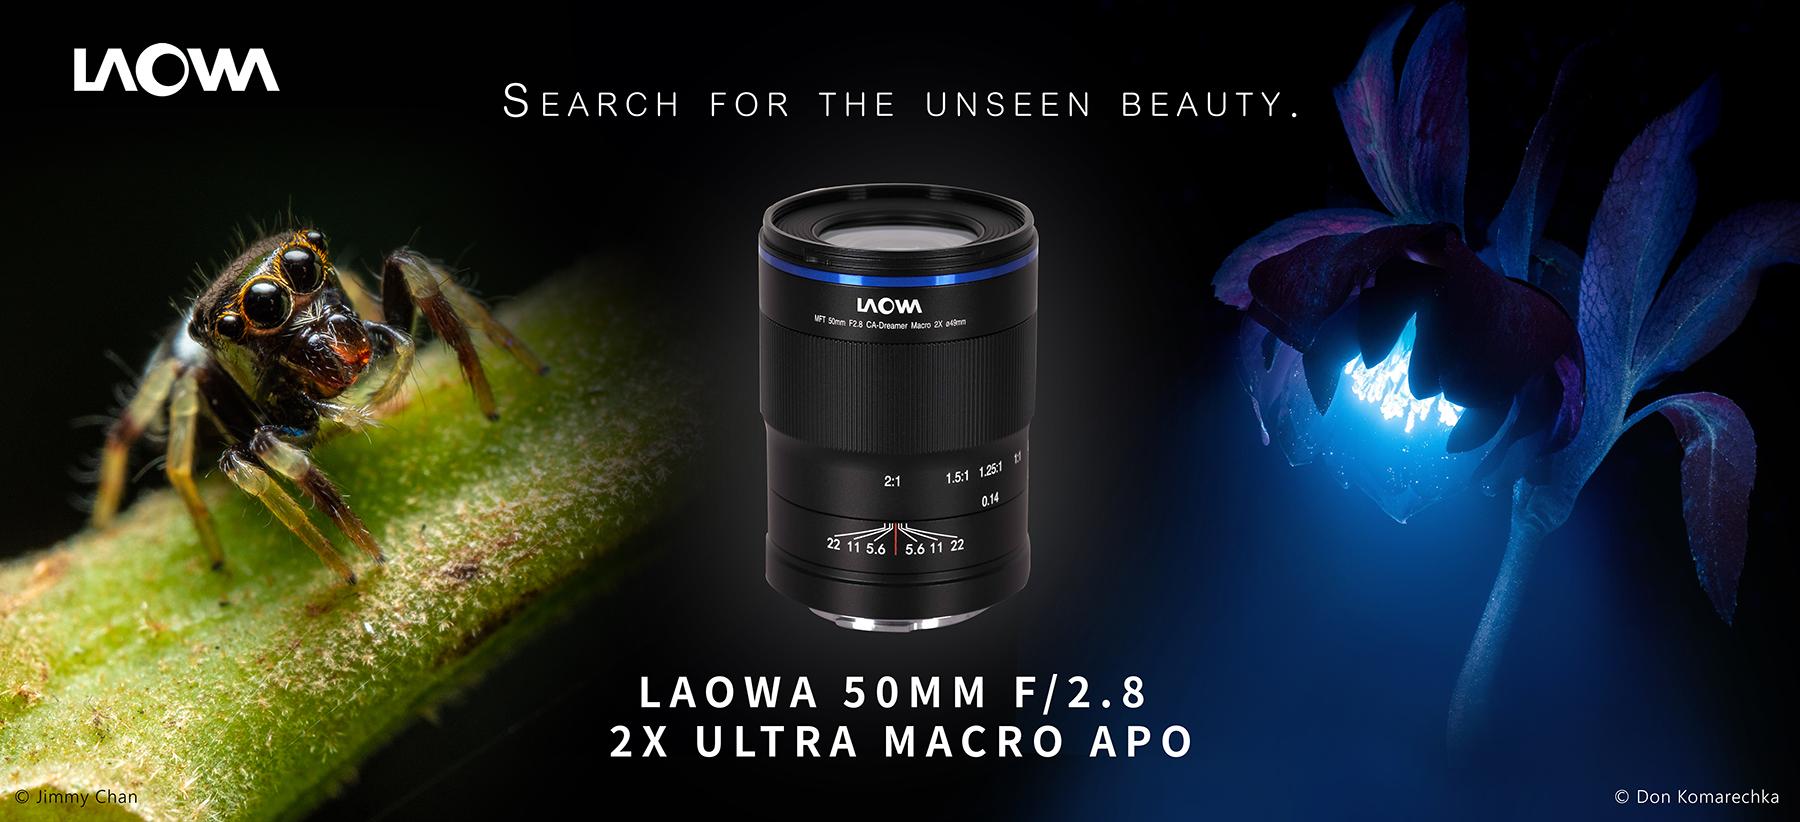 Venus Optics Laowa 50mm f/2.8 2x Macro lens for Micro 4/3